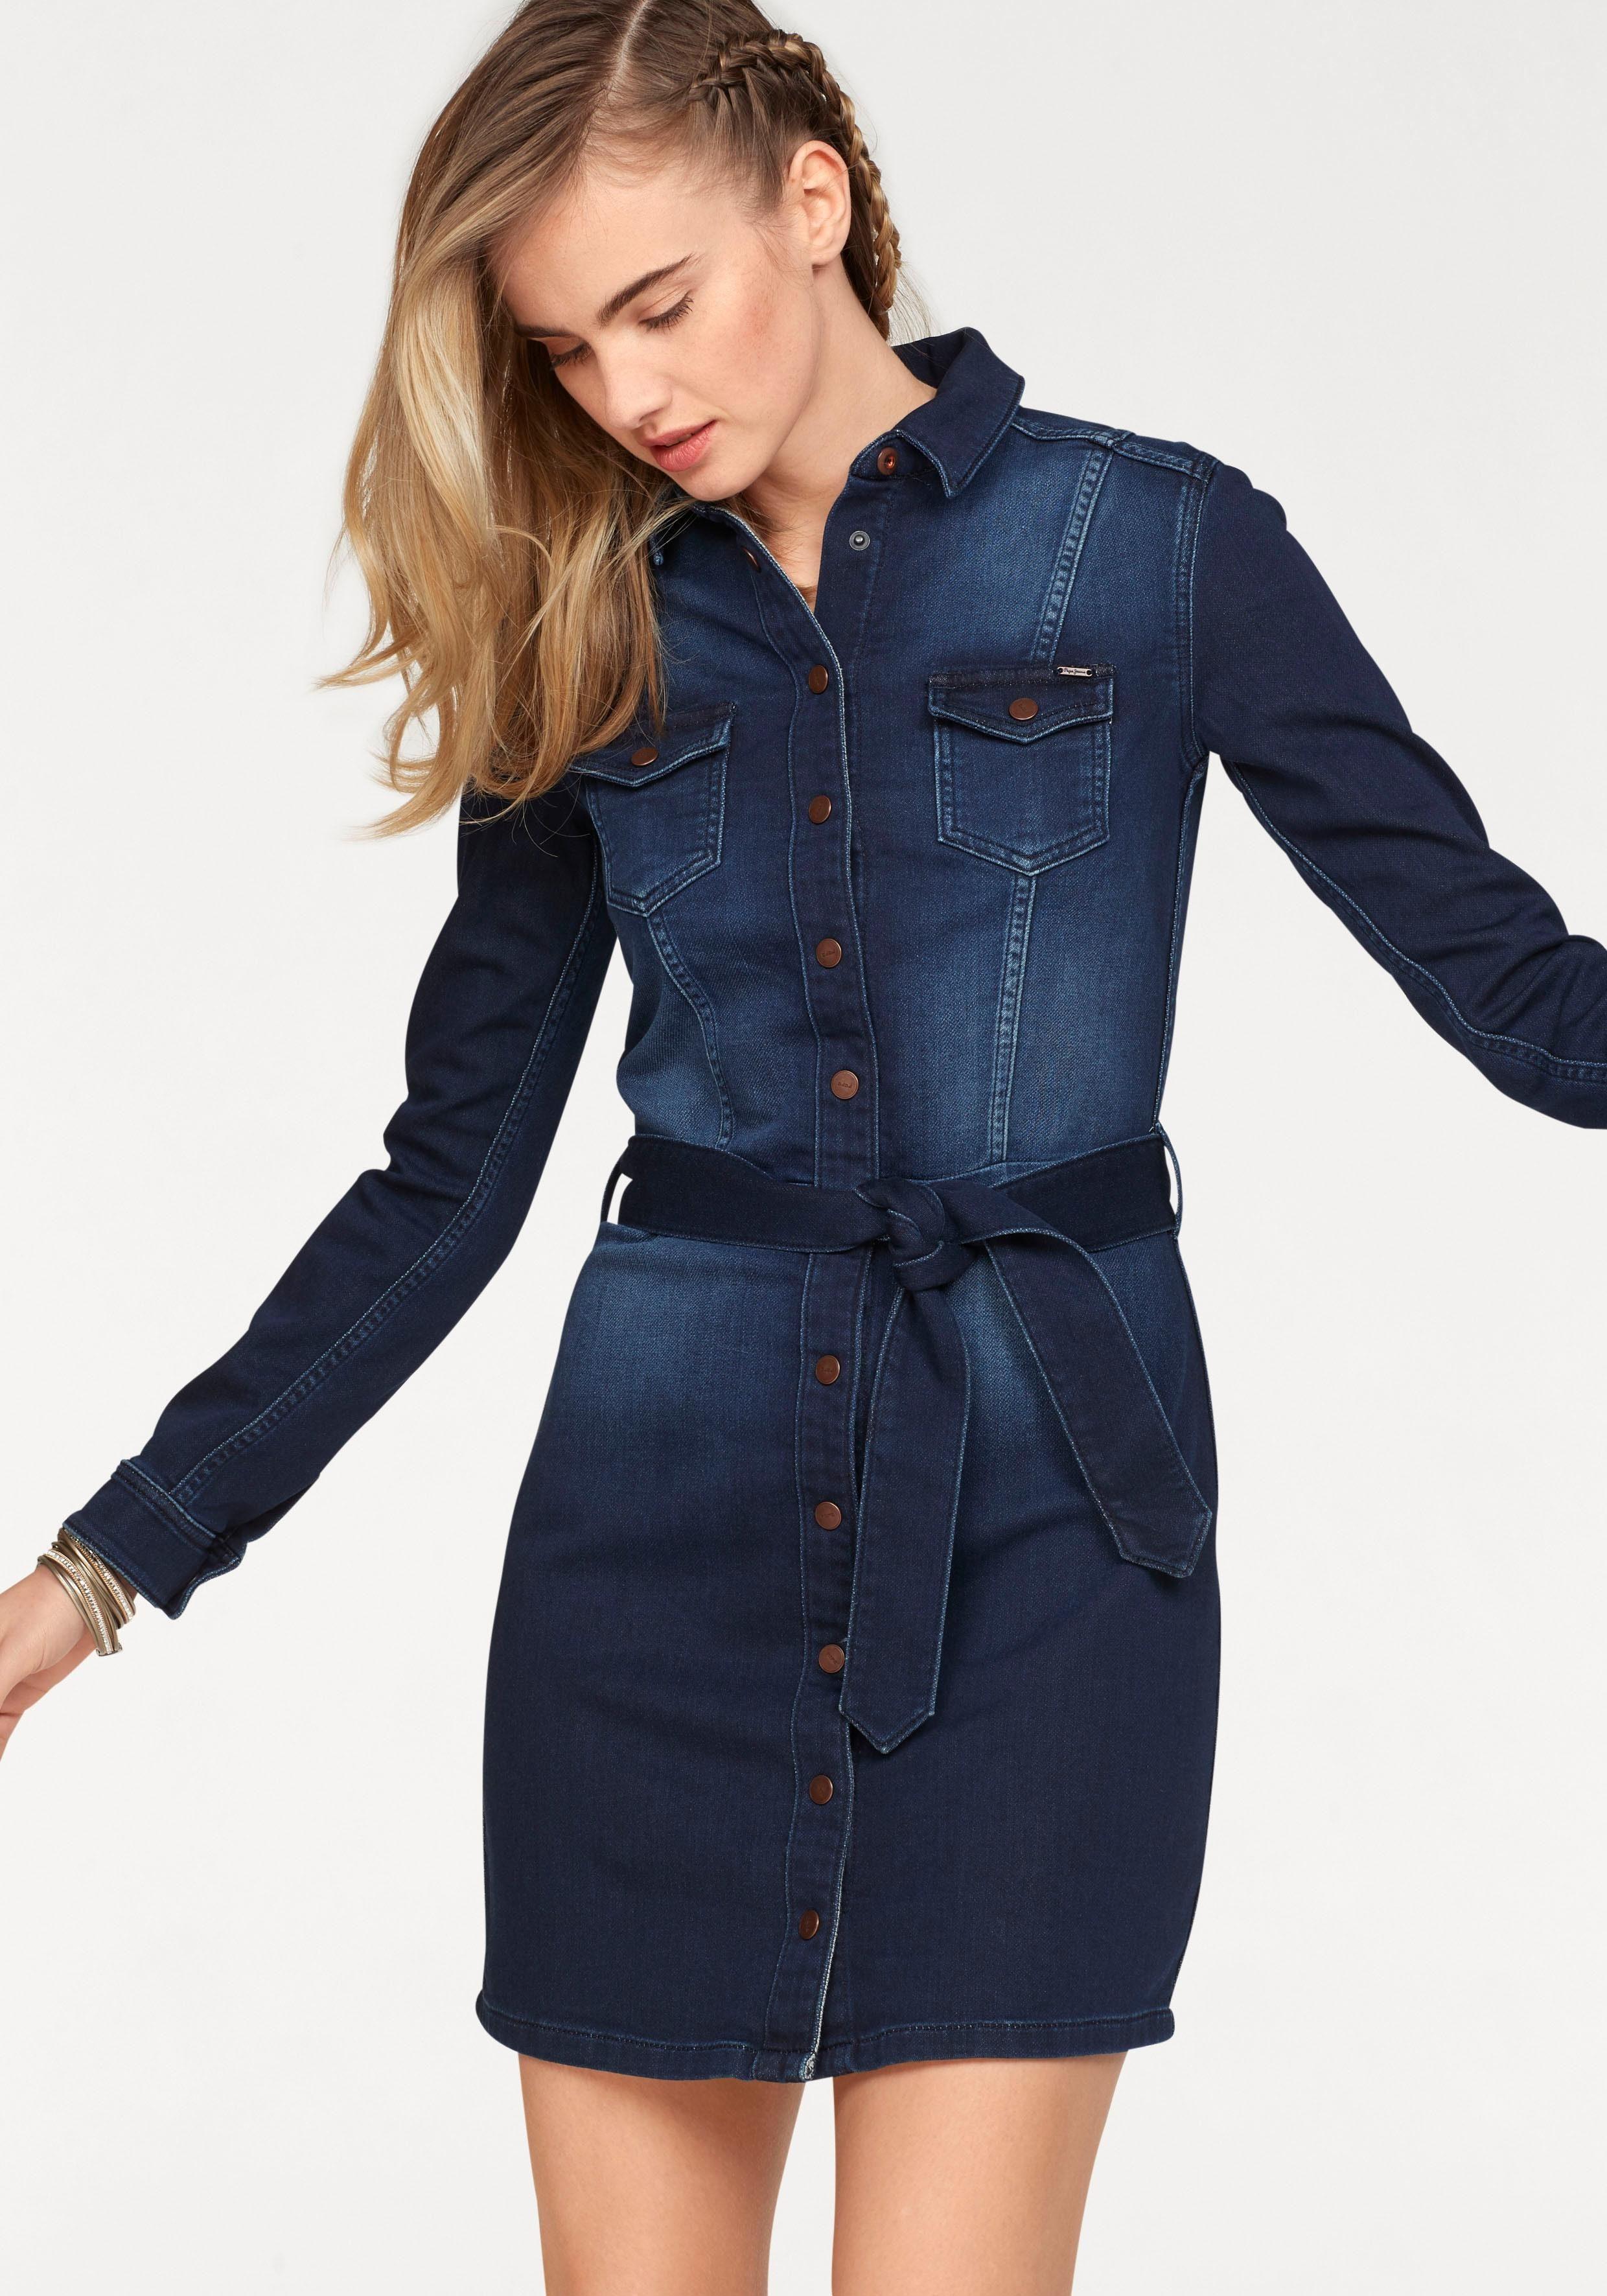 Pepe Jeans Jeanskleid NICOLE aus weichem Sweatdenim